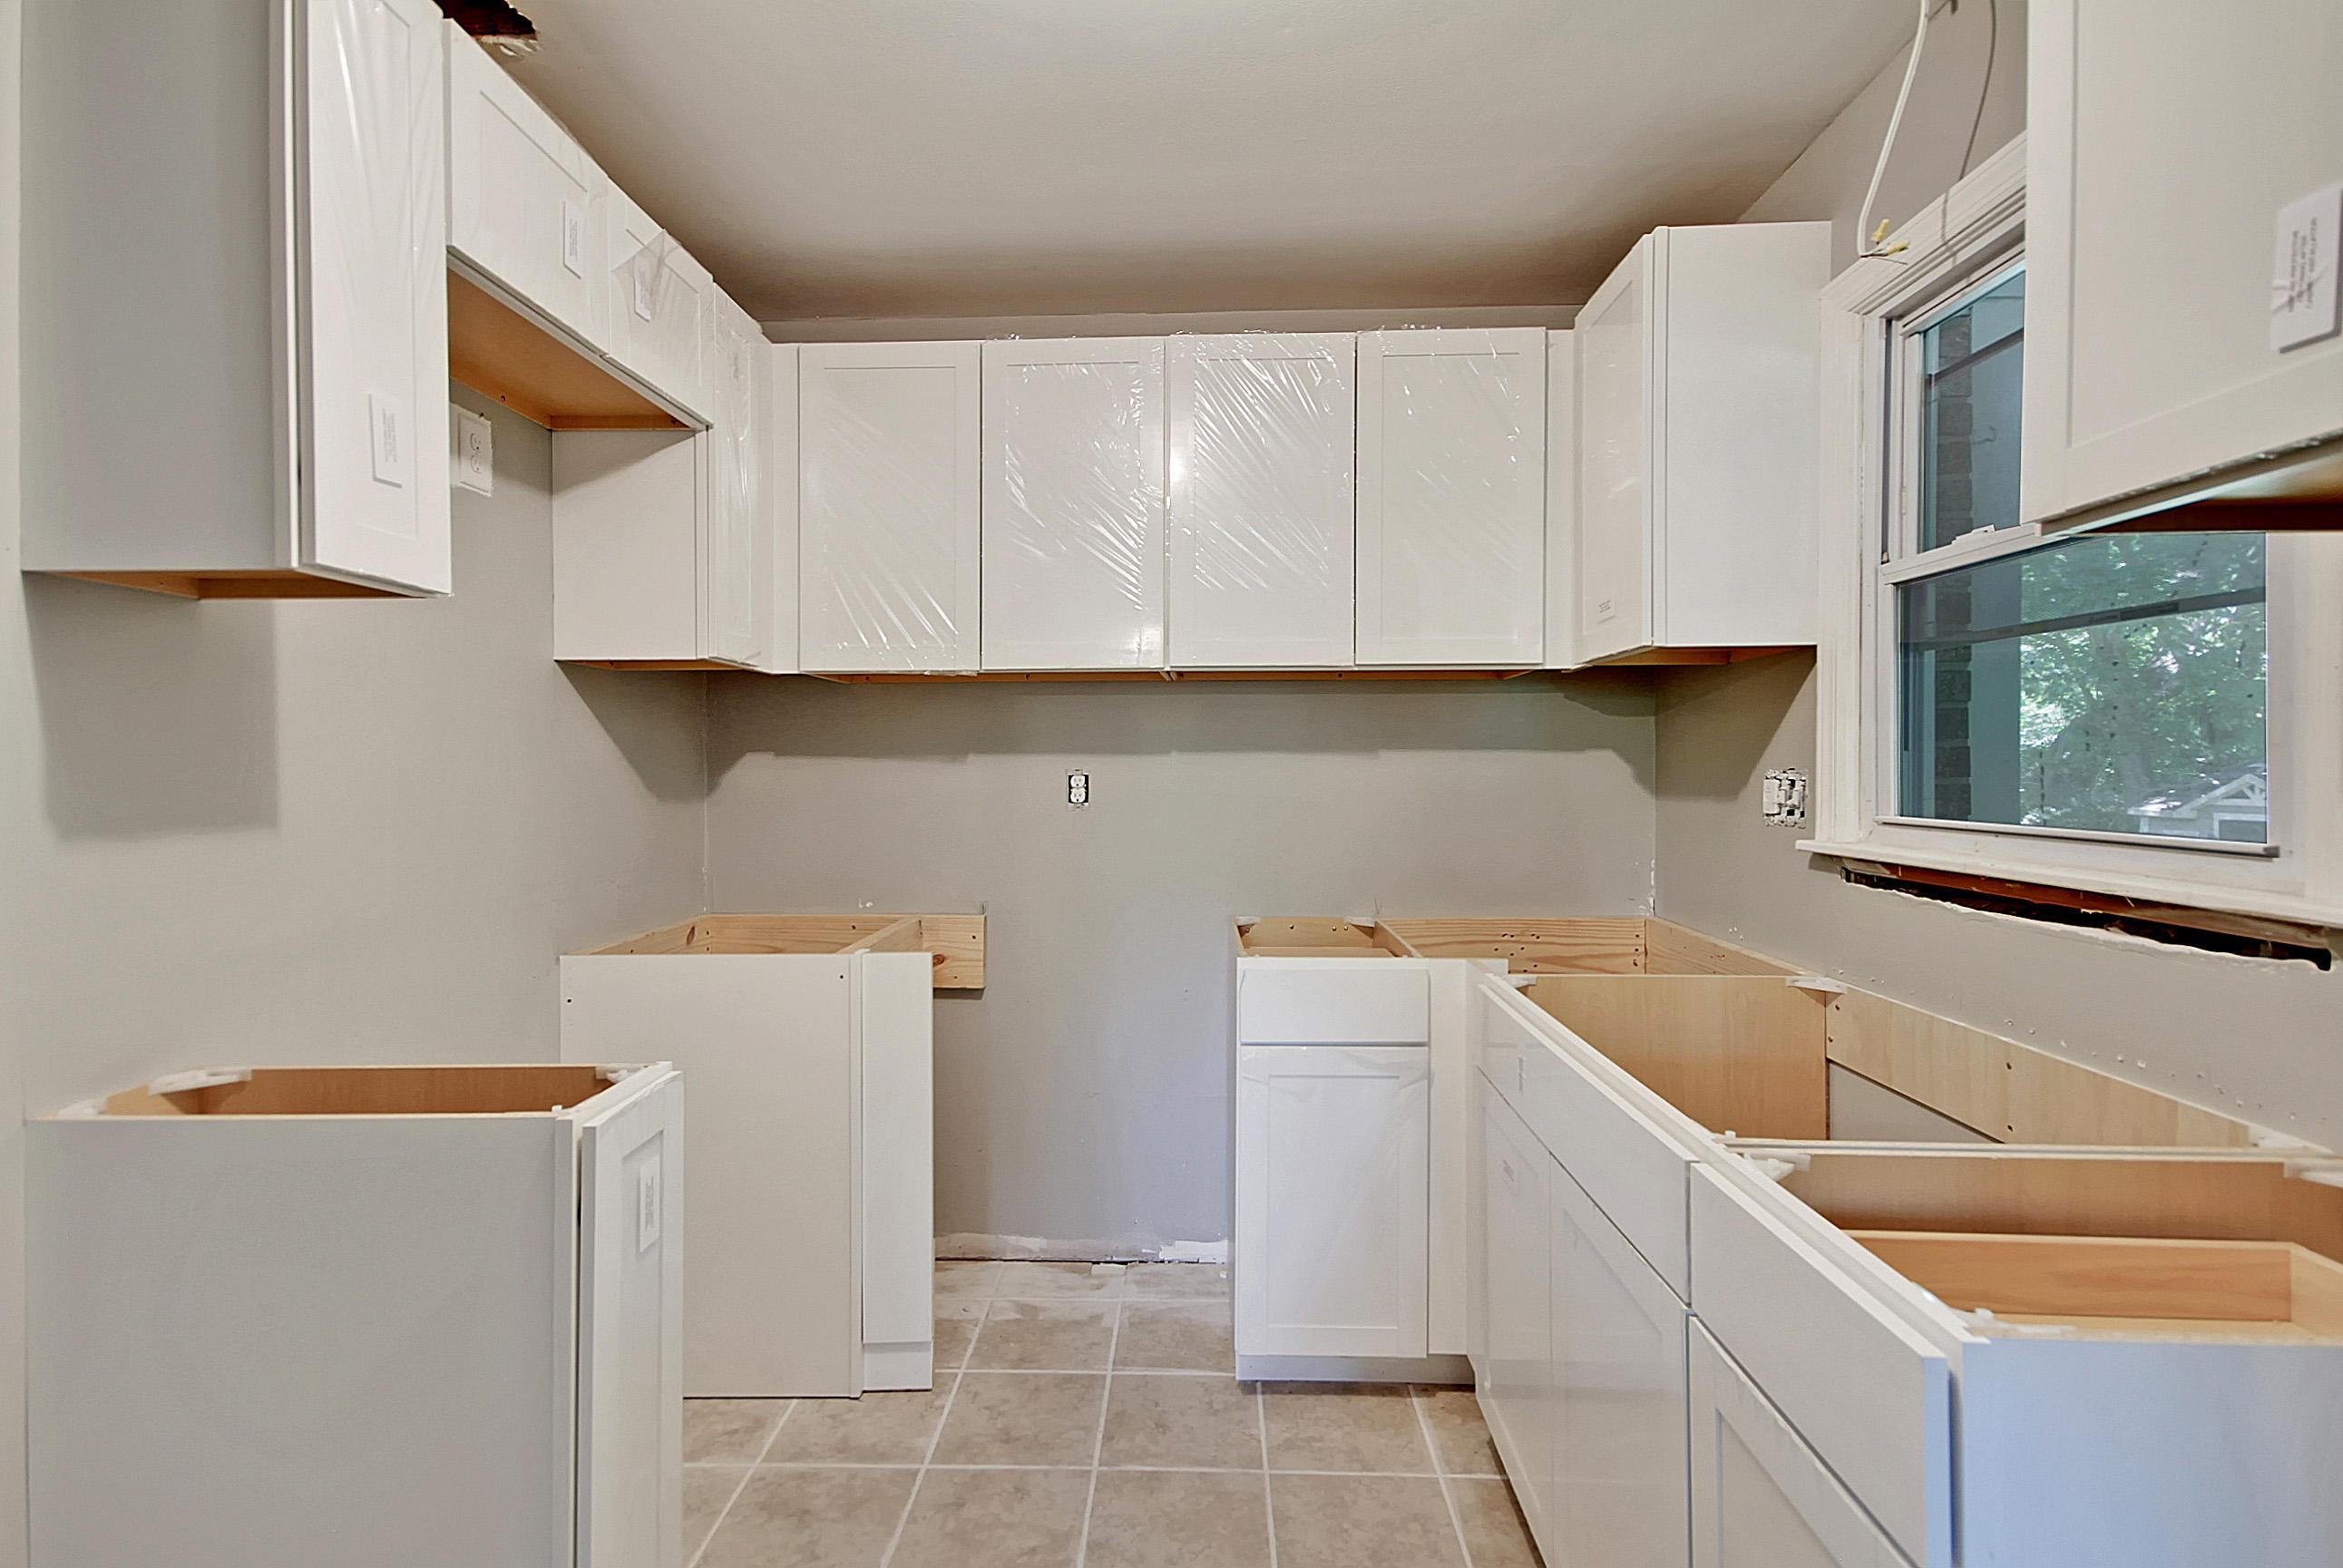 Northbridge Terrace Homes For Sale - 1094 Northbridge, Charleston, SC - 23